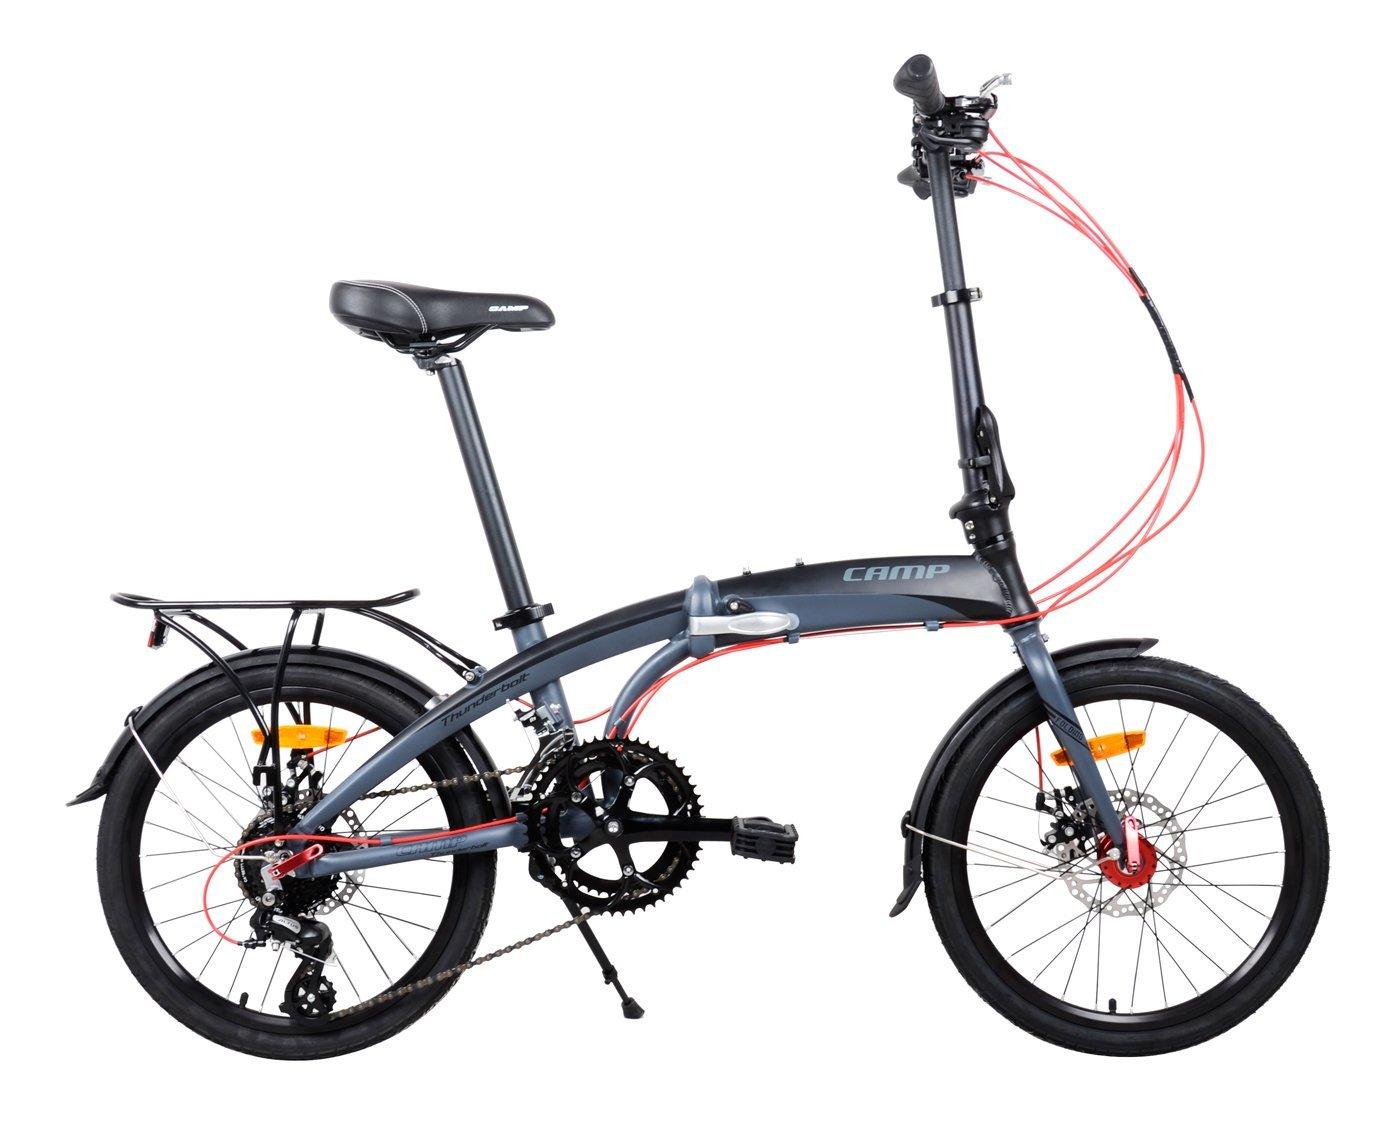 Camp Thunderbolt Folding Bike Review